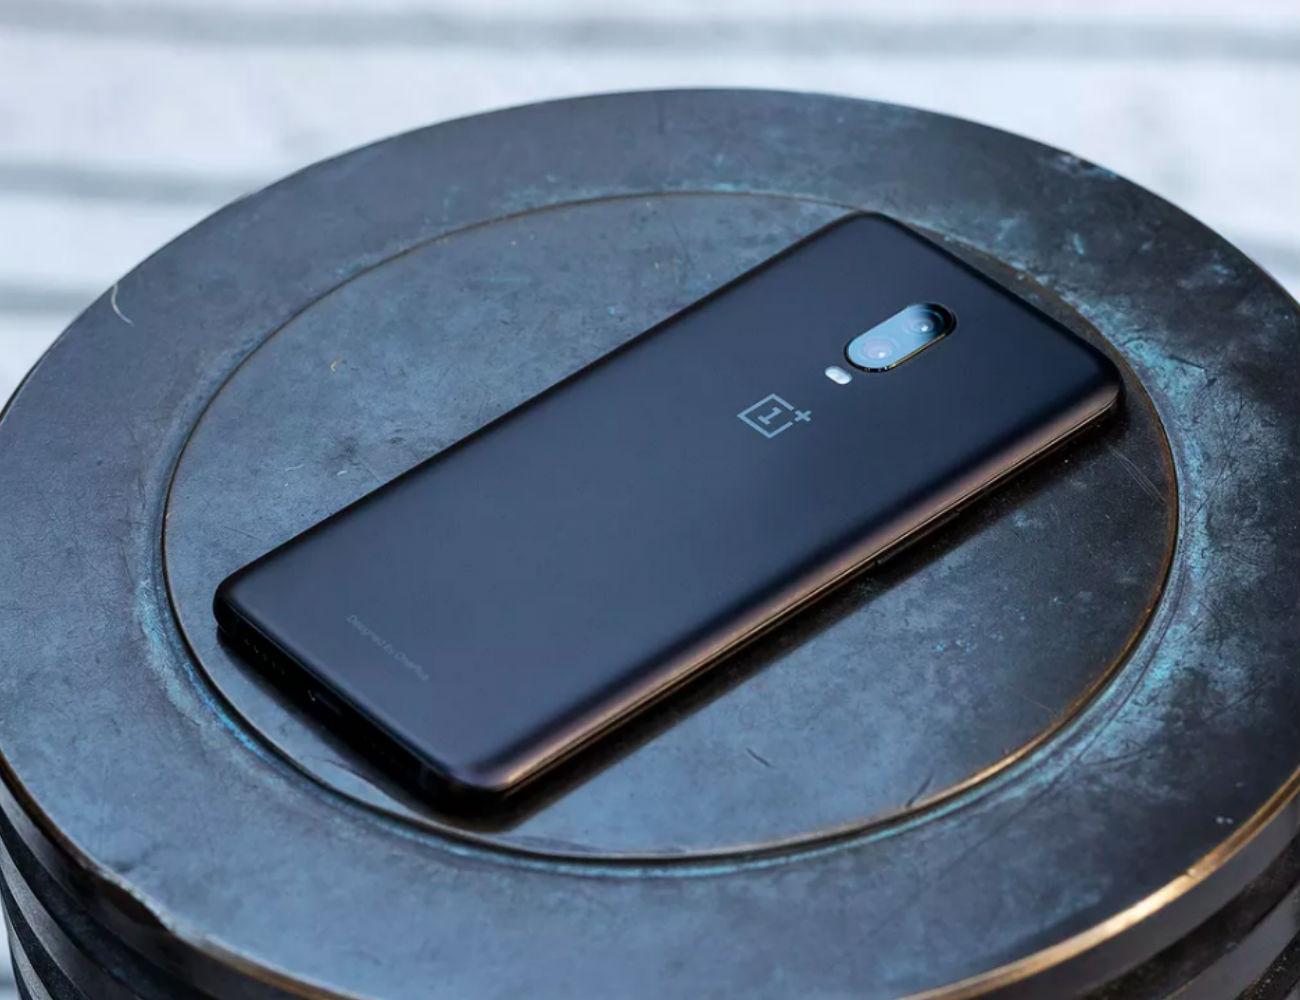 OnePlus 6T Smartphone